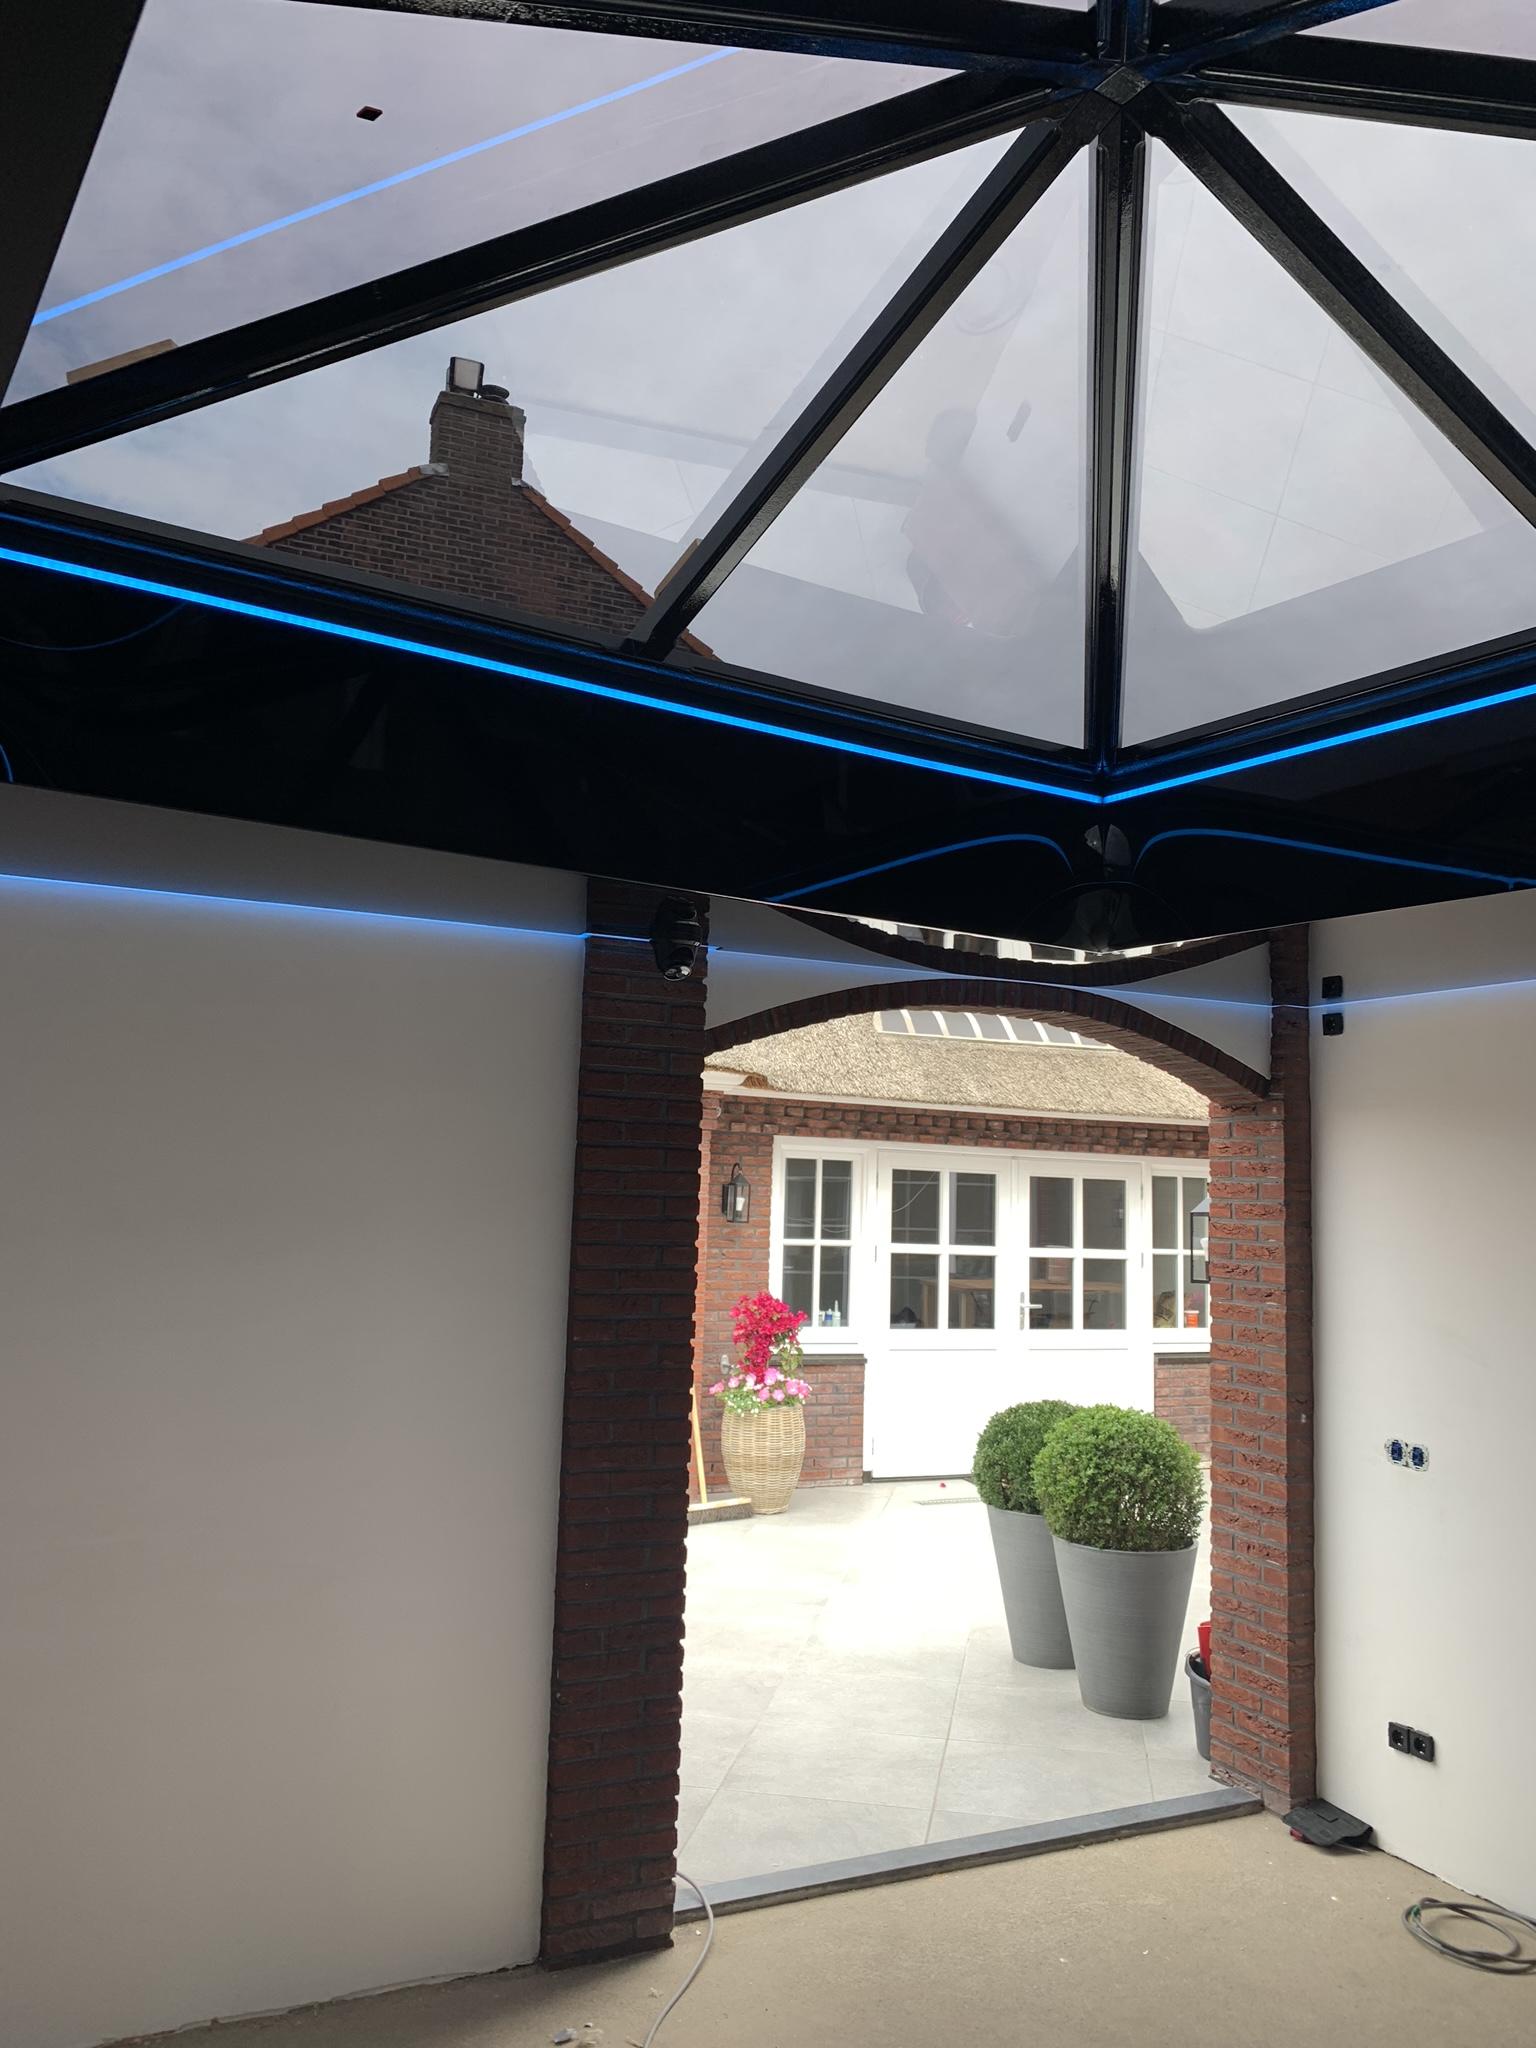 verlichte plafond boven uw overkapping of garage